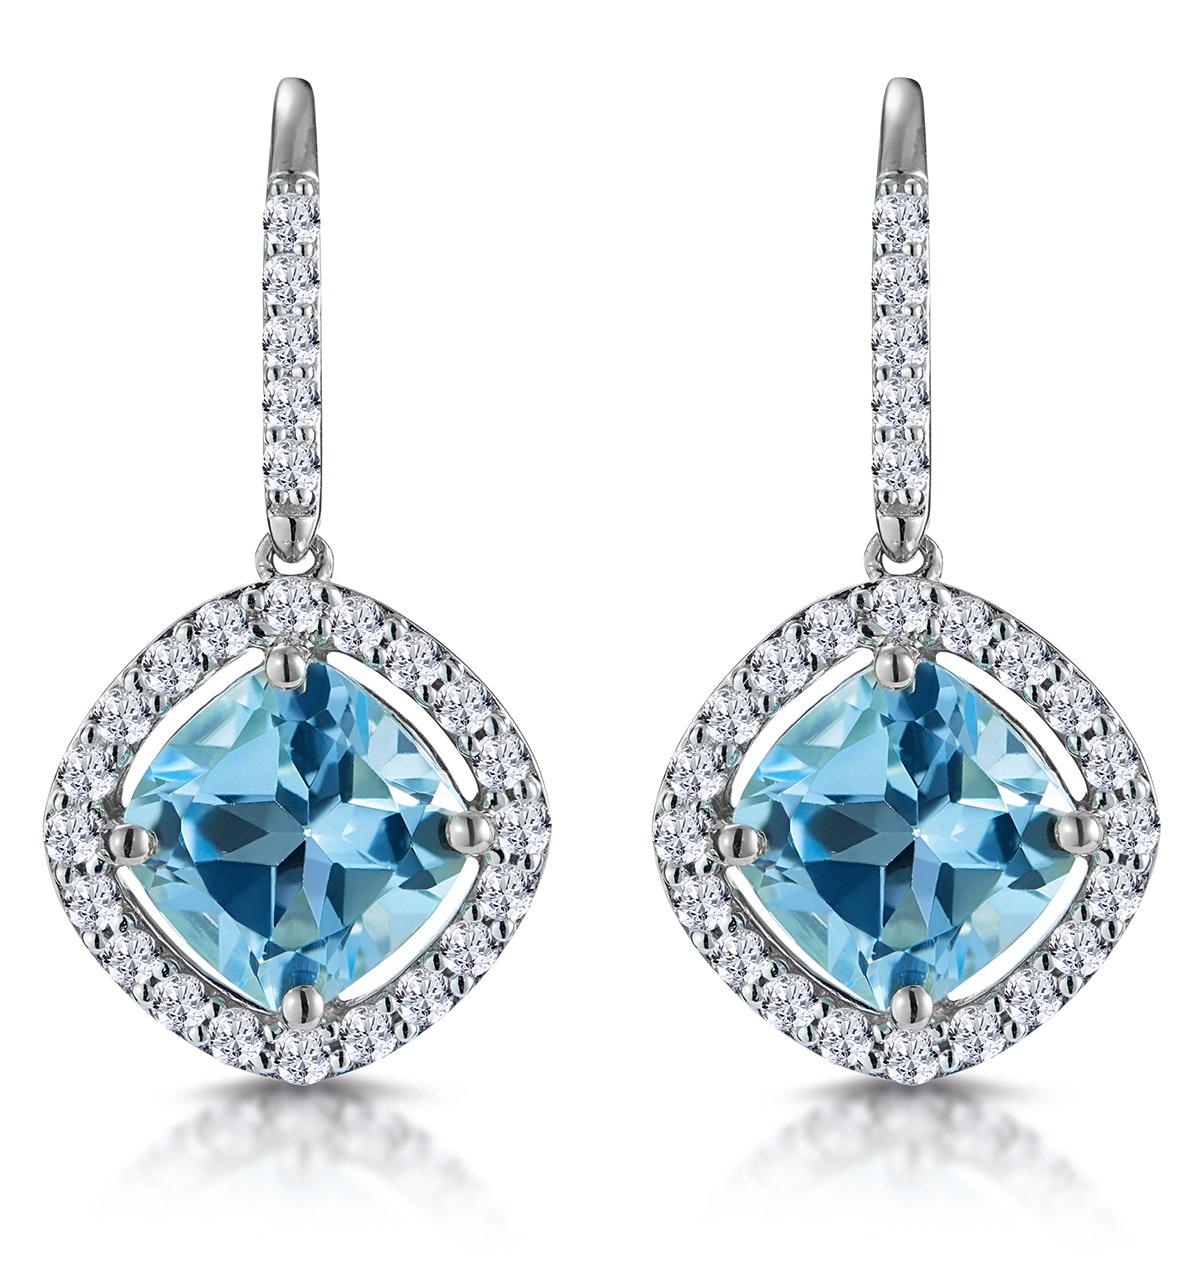 2.5ct Blue Topaz and Diamond Halo Asteria Earrings 18K White Gold